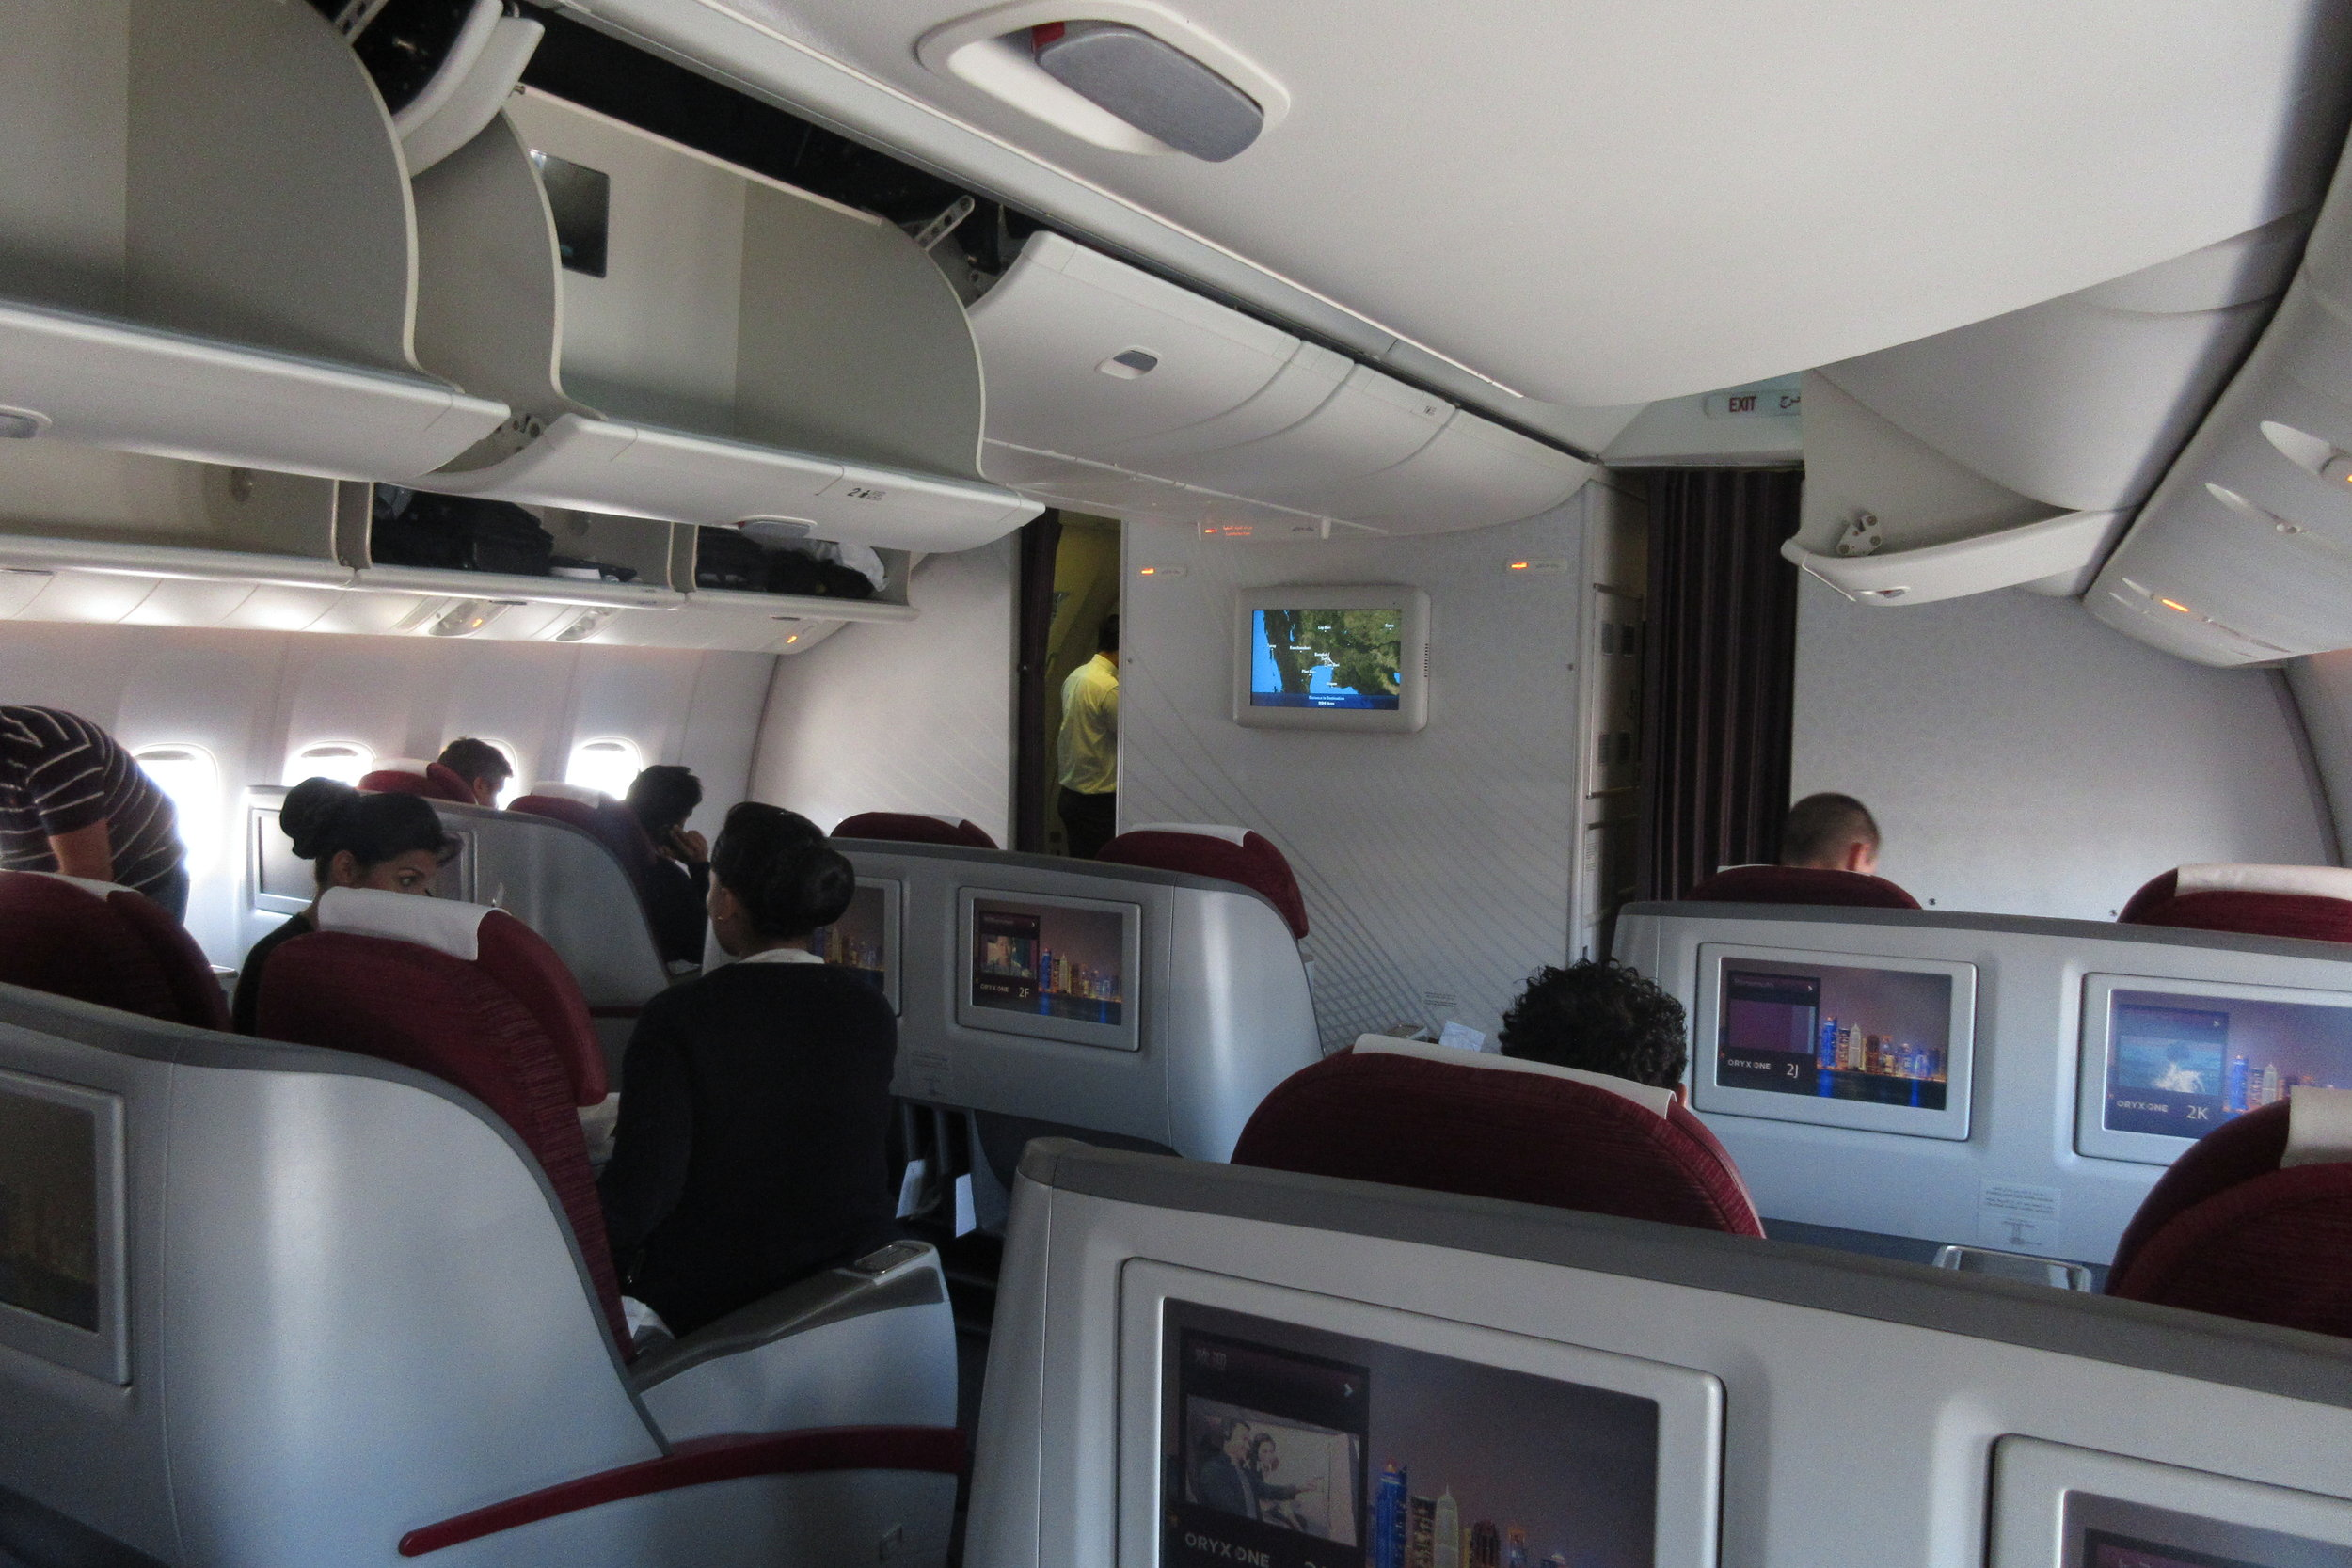 Qatar Airways 777 business class – Cabin